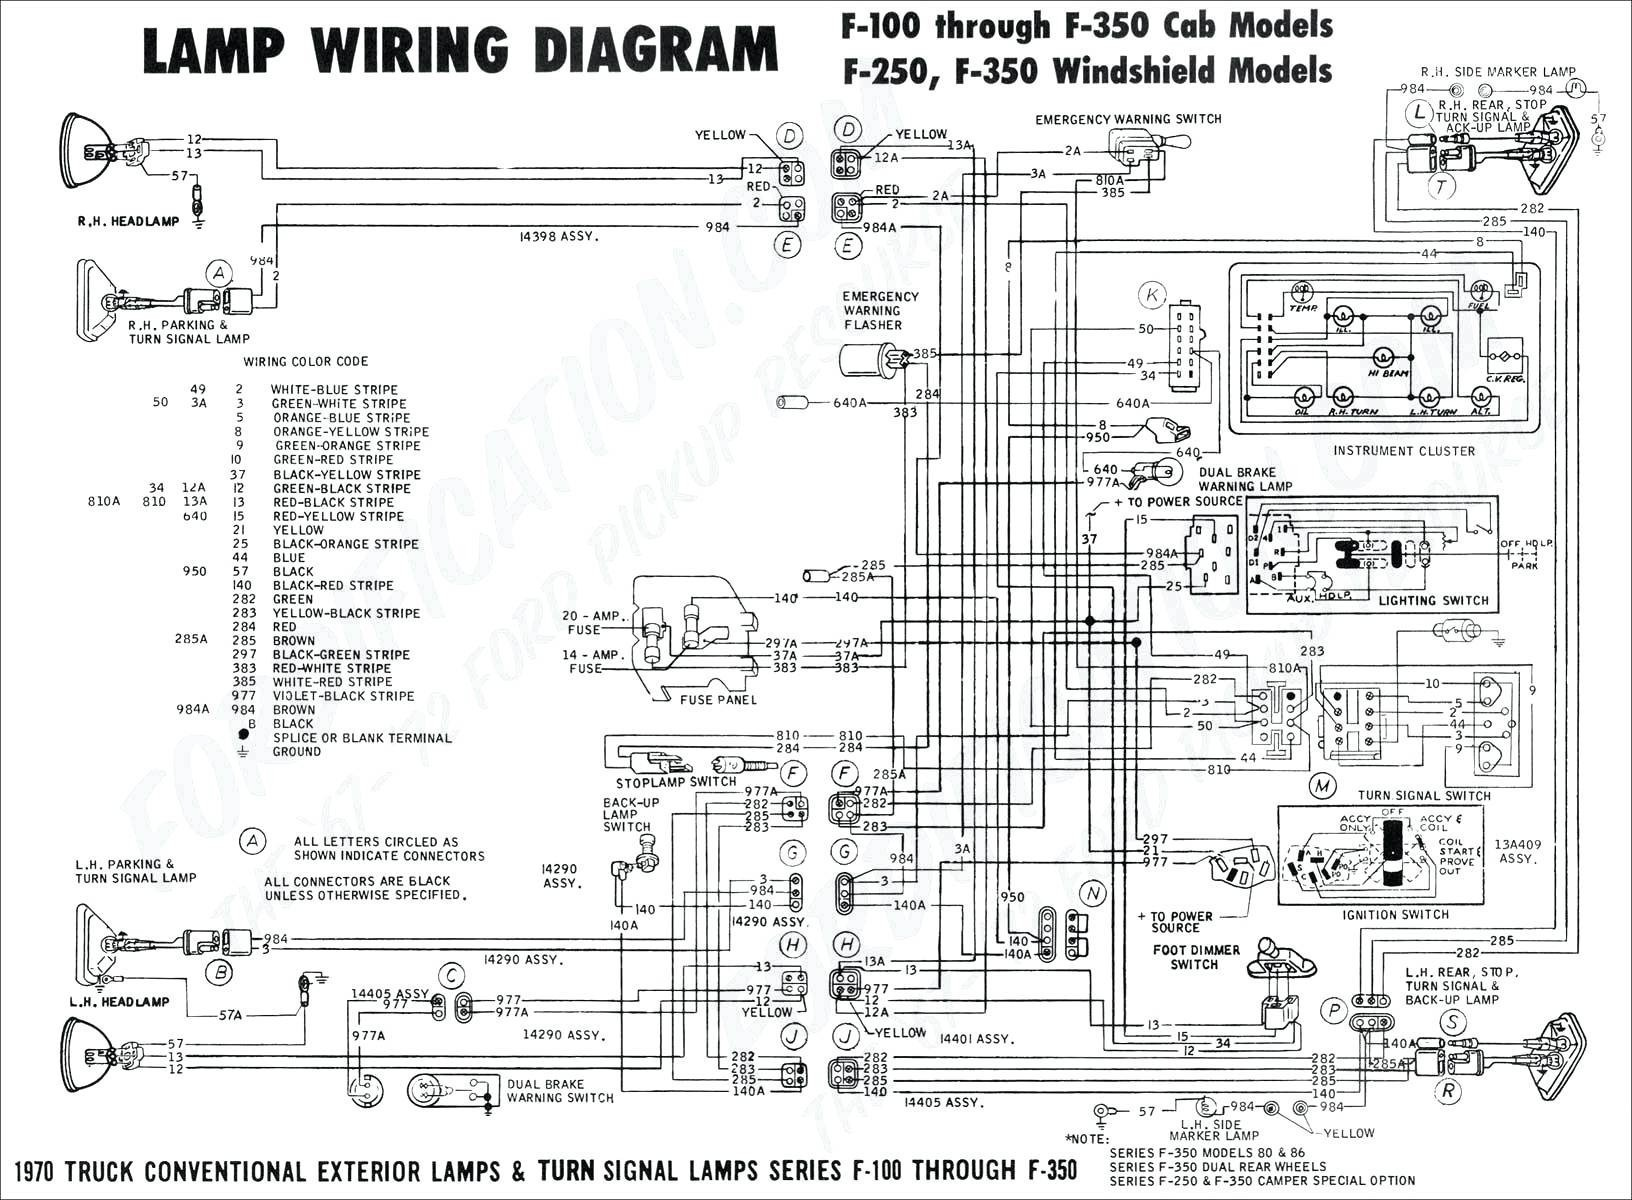 Toyota 3 0 V6 Engine Diagram ford V6 3 7 Engine Diagram Wiring Diagram Imp Of Toyota 3 0 V6 Engine Diagram